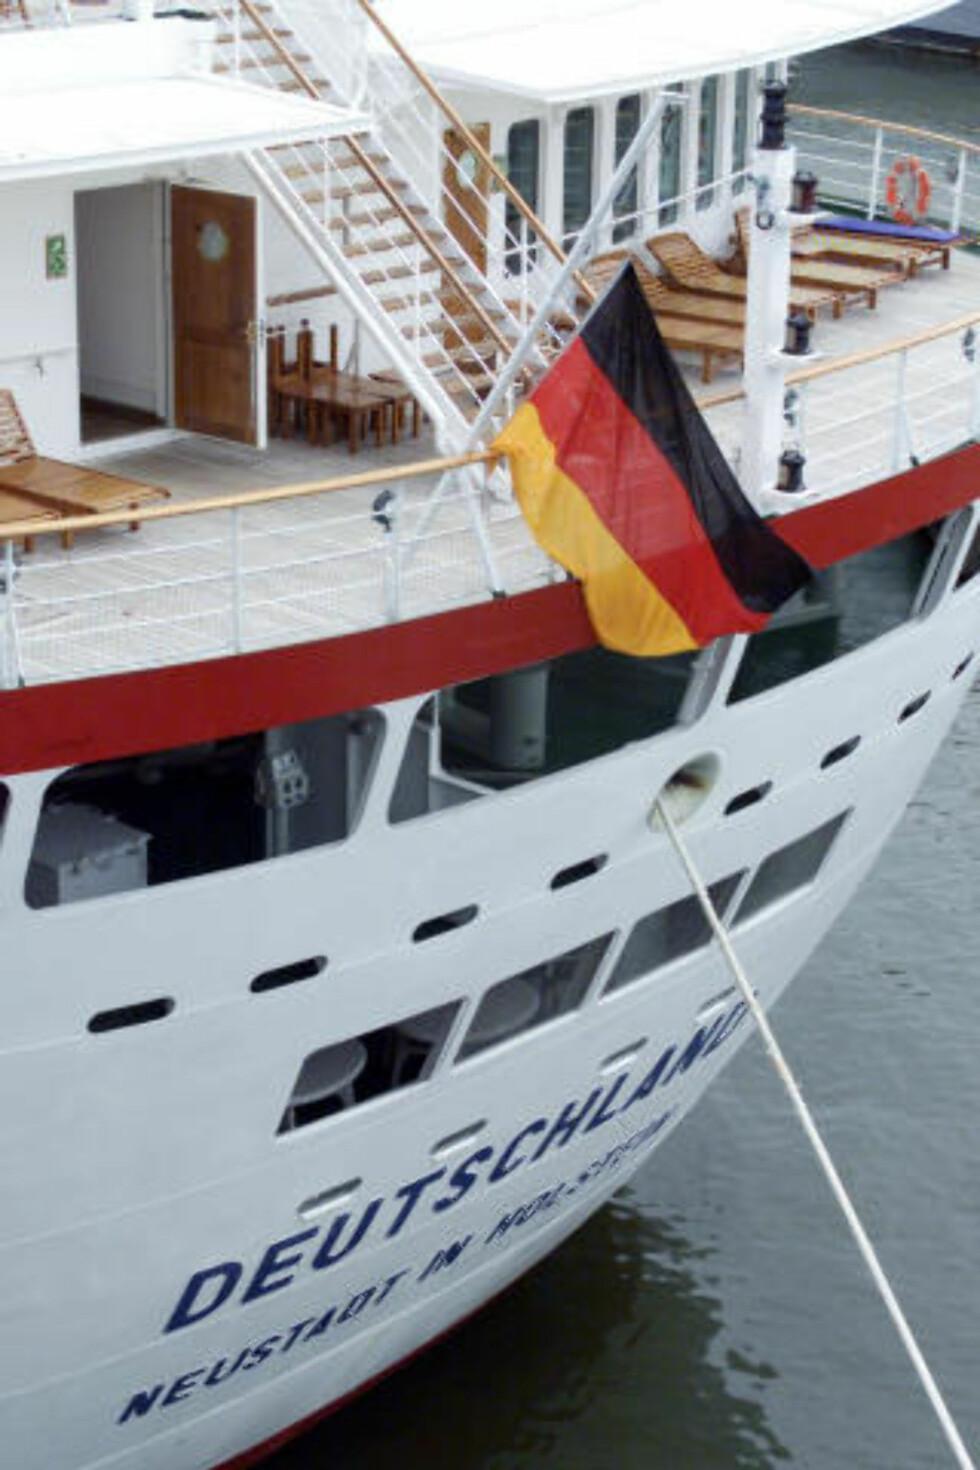 TYSK: «MS Deutschland» tilhører det tyske rederiet Dellmann. Foto: REUTERS/Peter Morgan